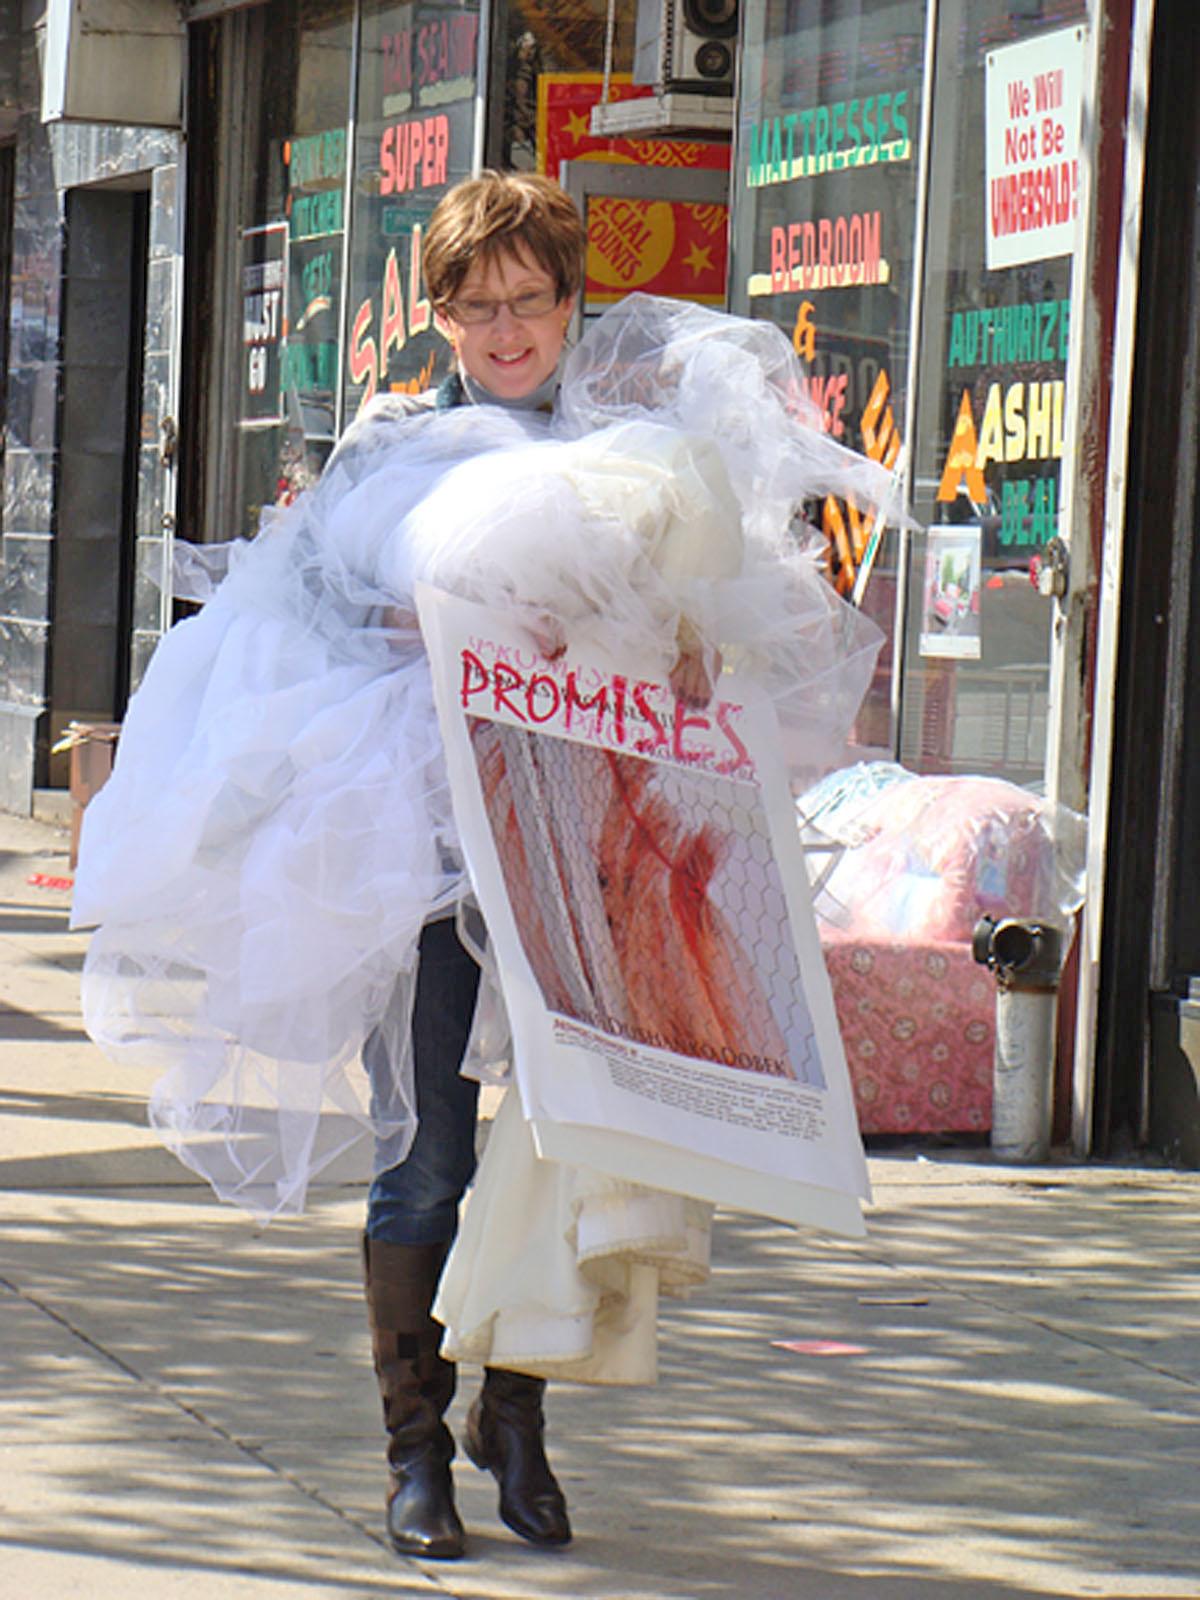 dushanko dobek collecting petticoats 5388.jpg